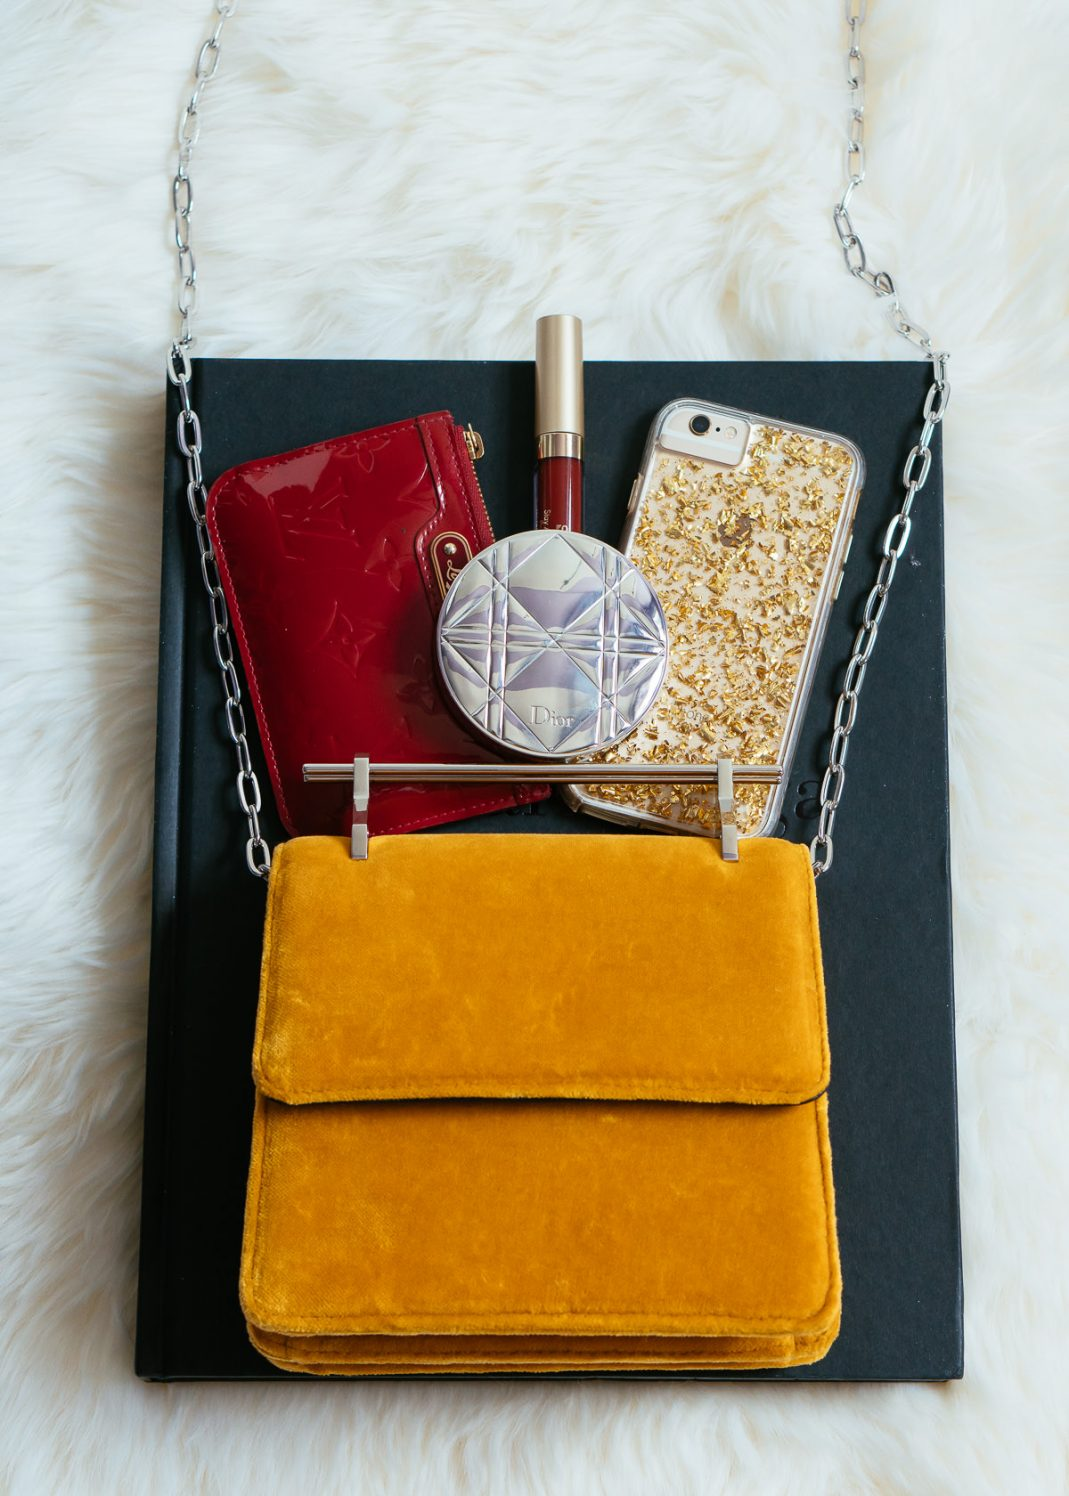 7a93bf96012c Loving Lately: M2Malletier's Amori Fati Mini is the Velvet Bag You Need Now  | PurseBlog.com | Bloglovin'